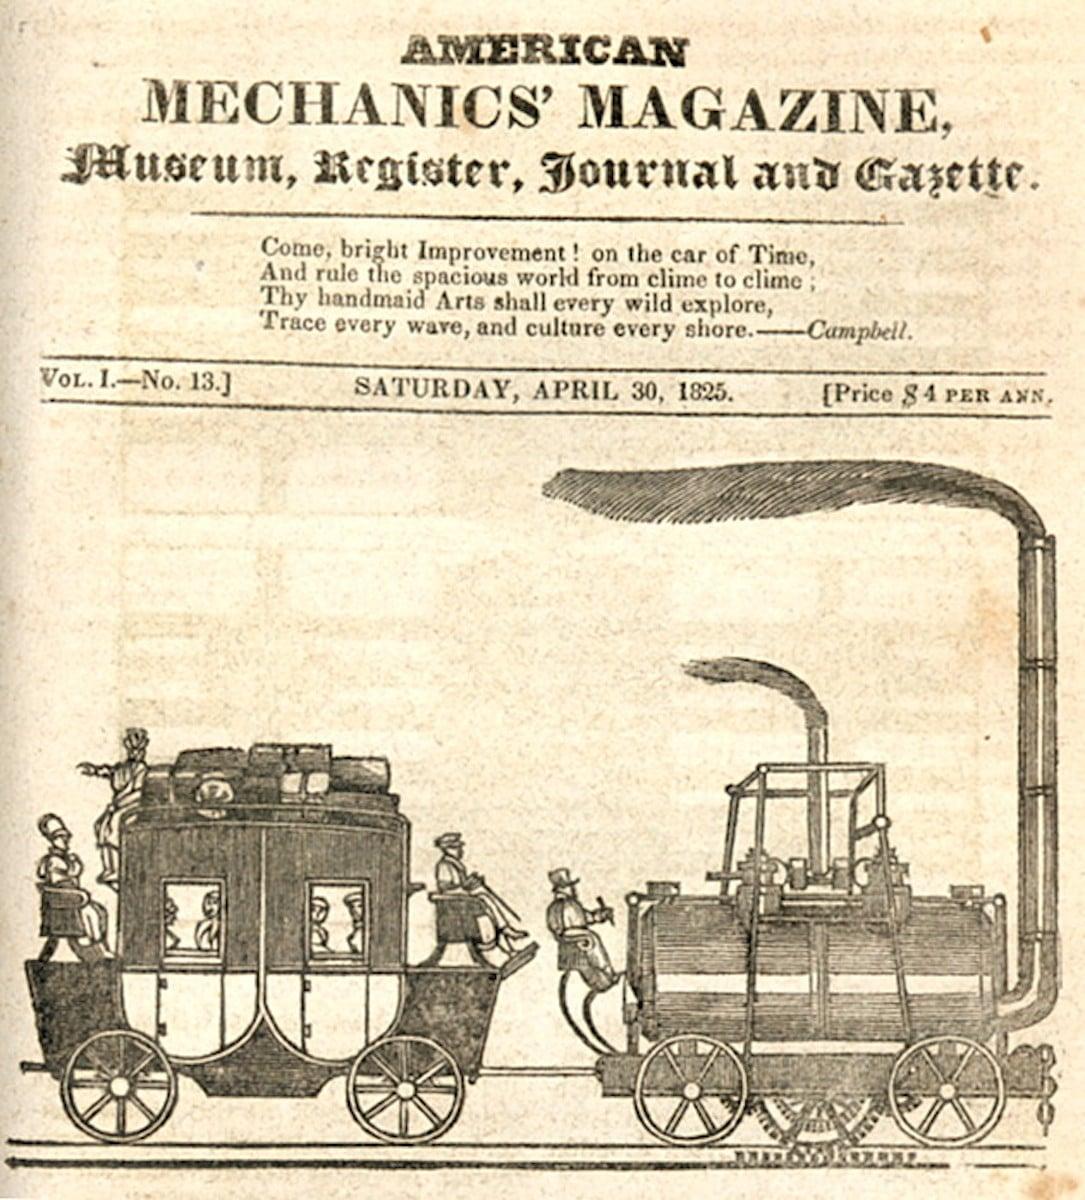 American Mechanic's Magazine